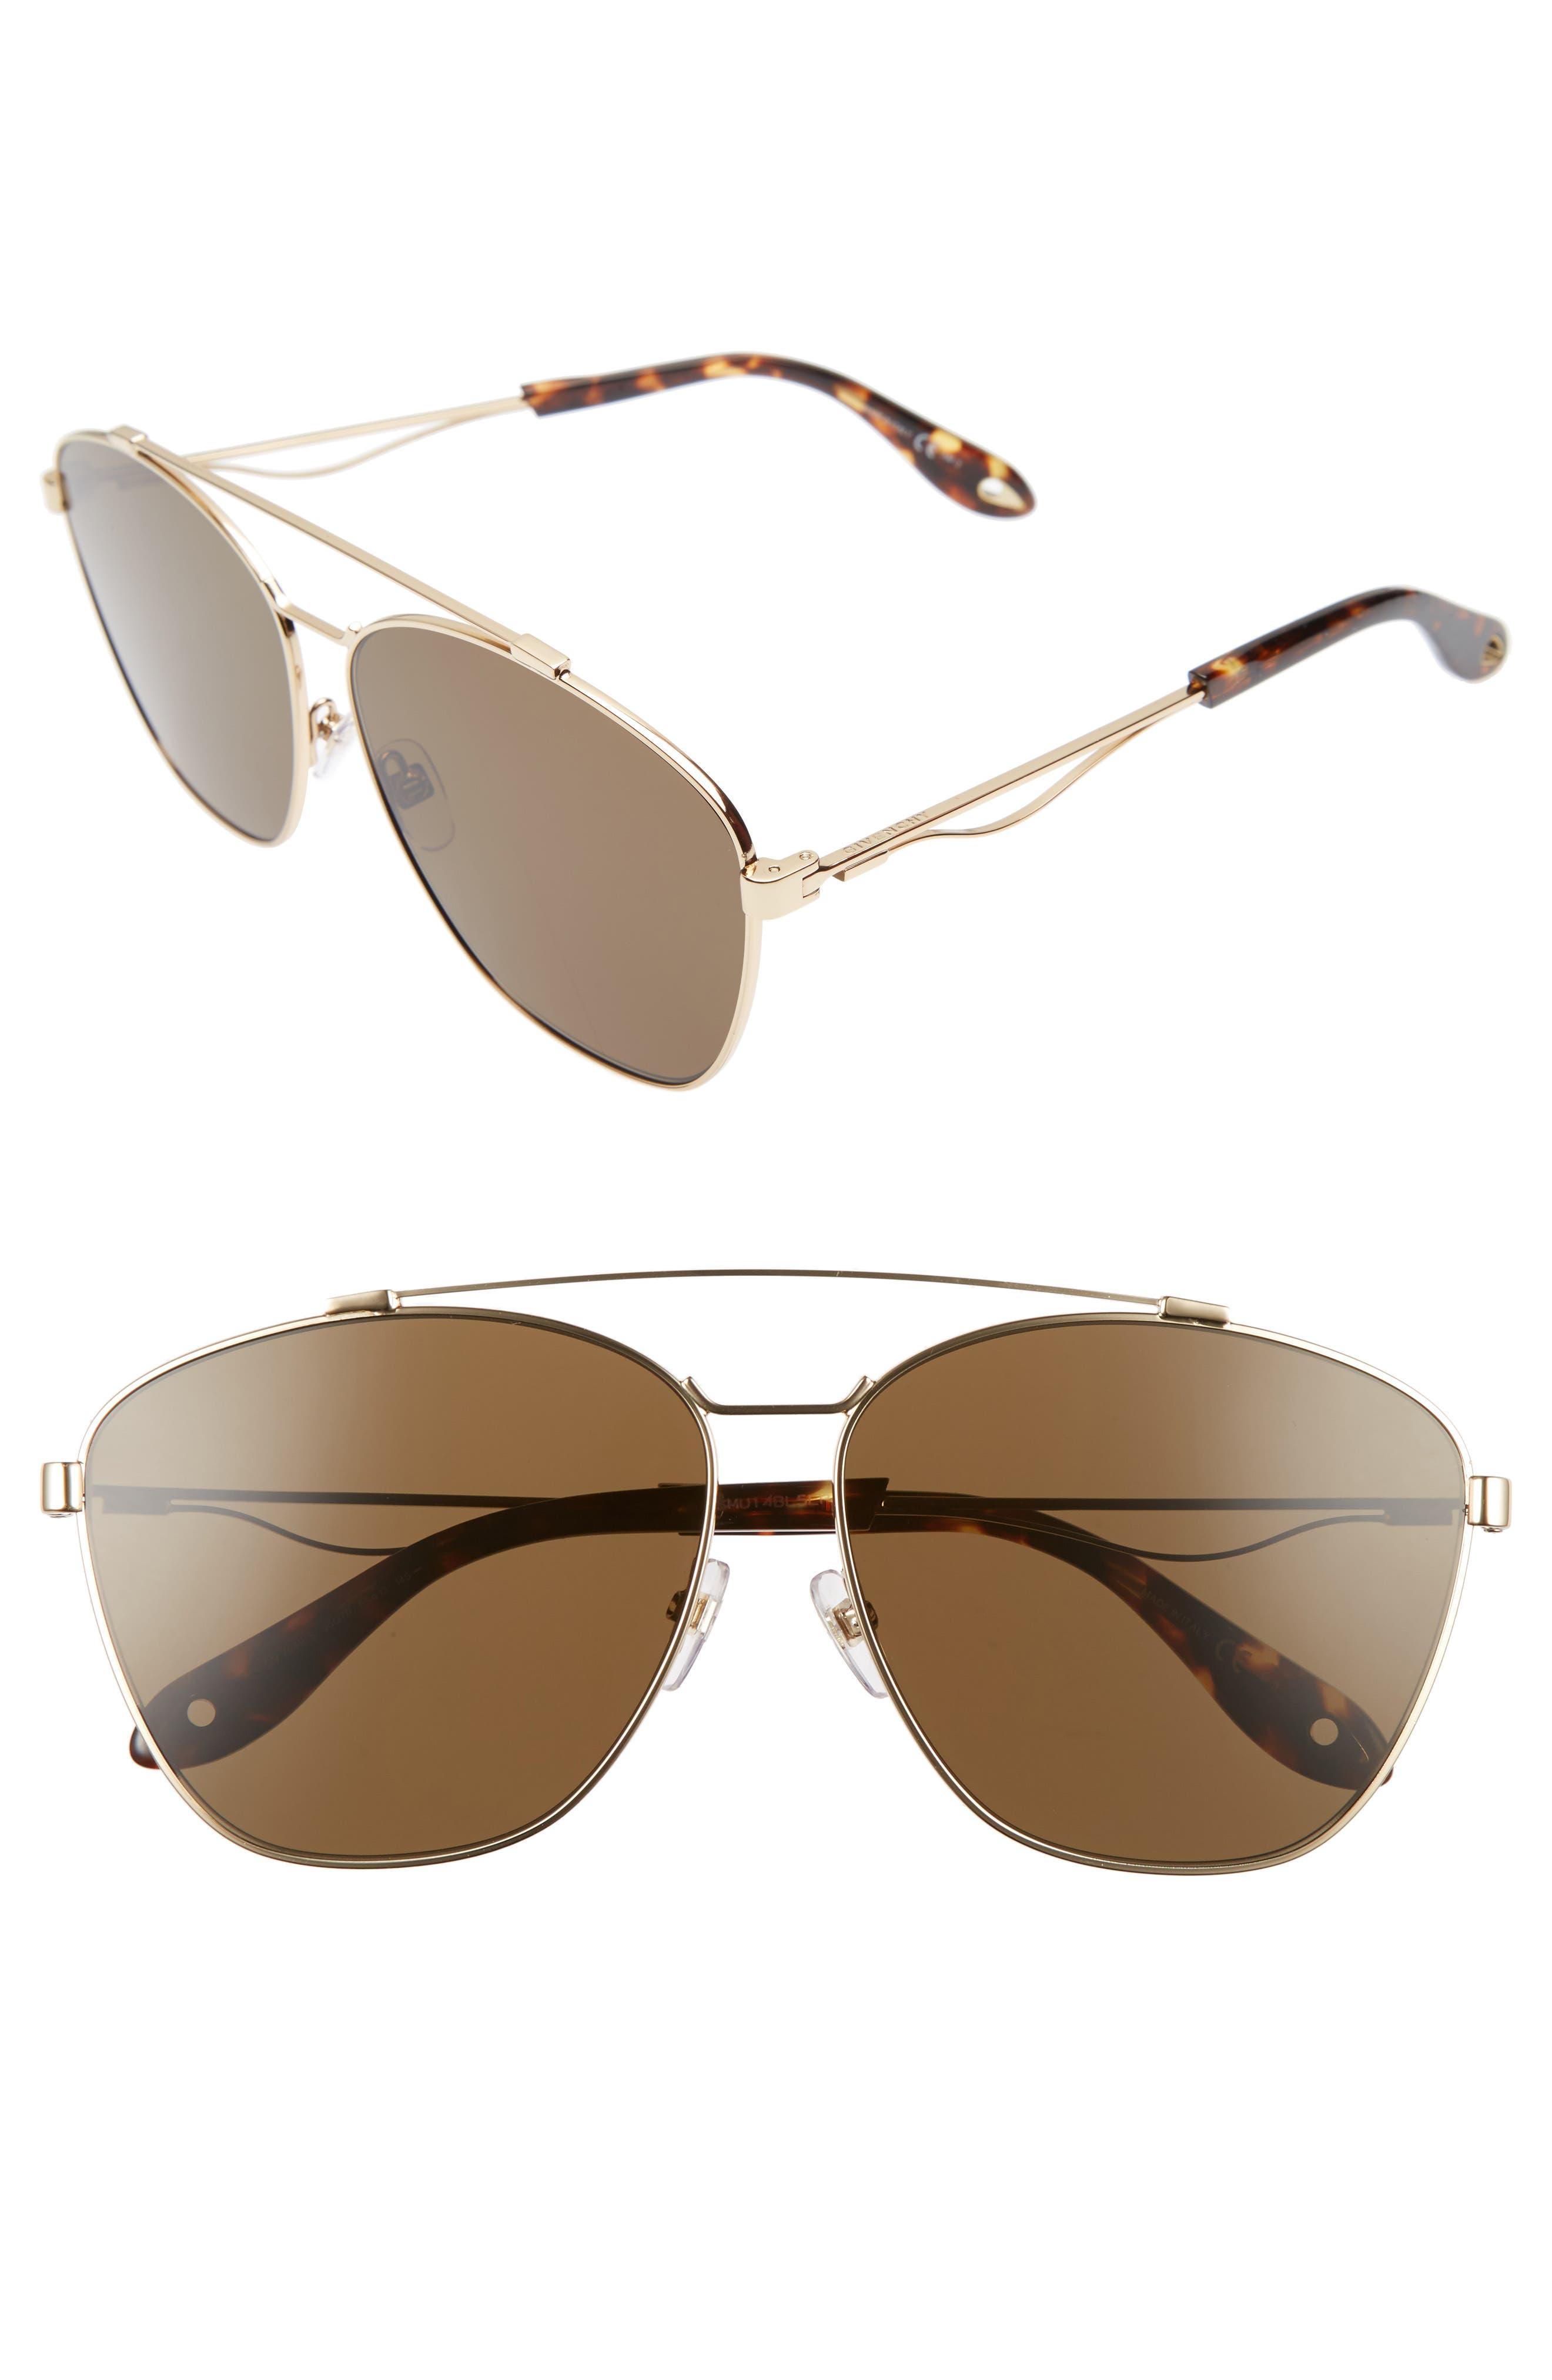 65mm Round Aviator Sunglasses,                         Main,                         color, Gold